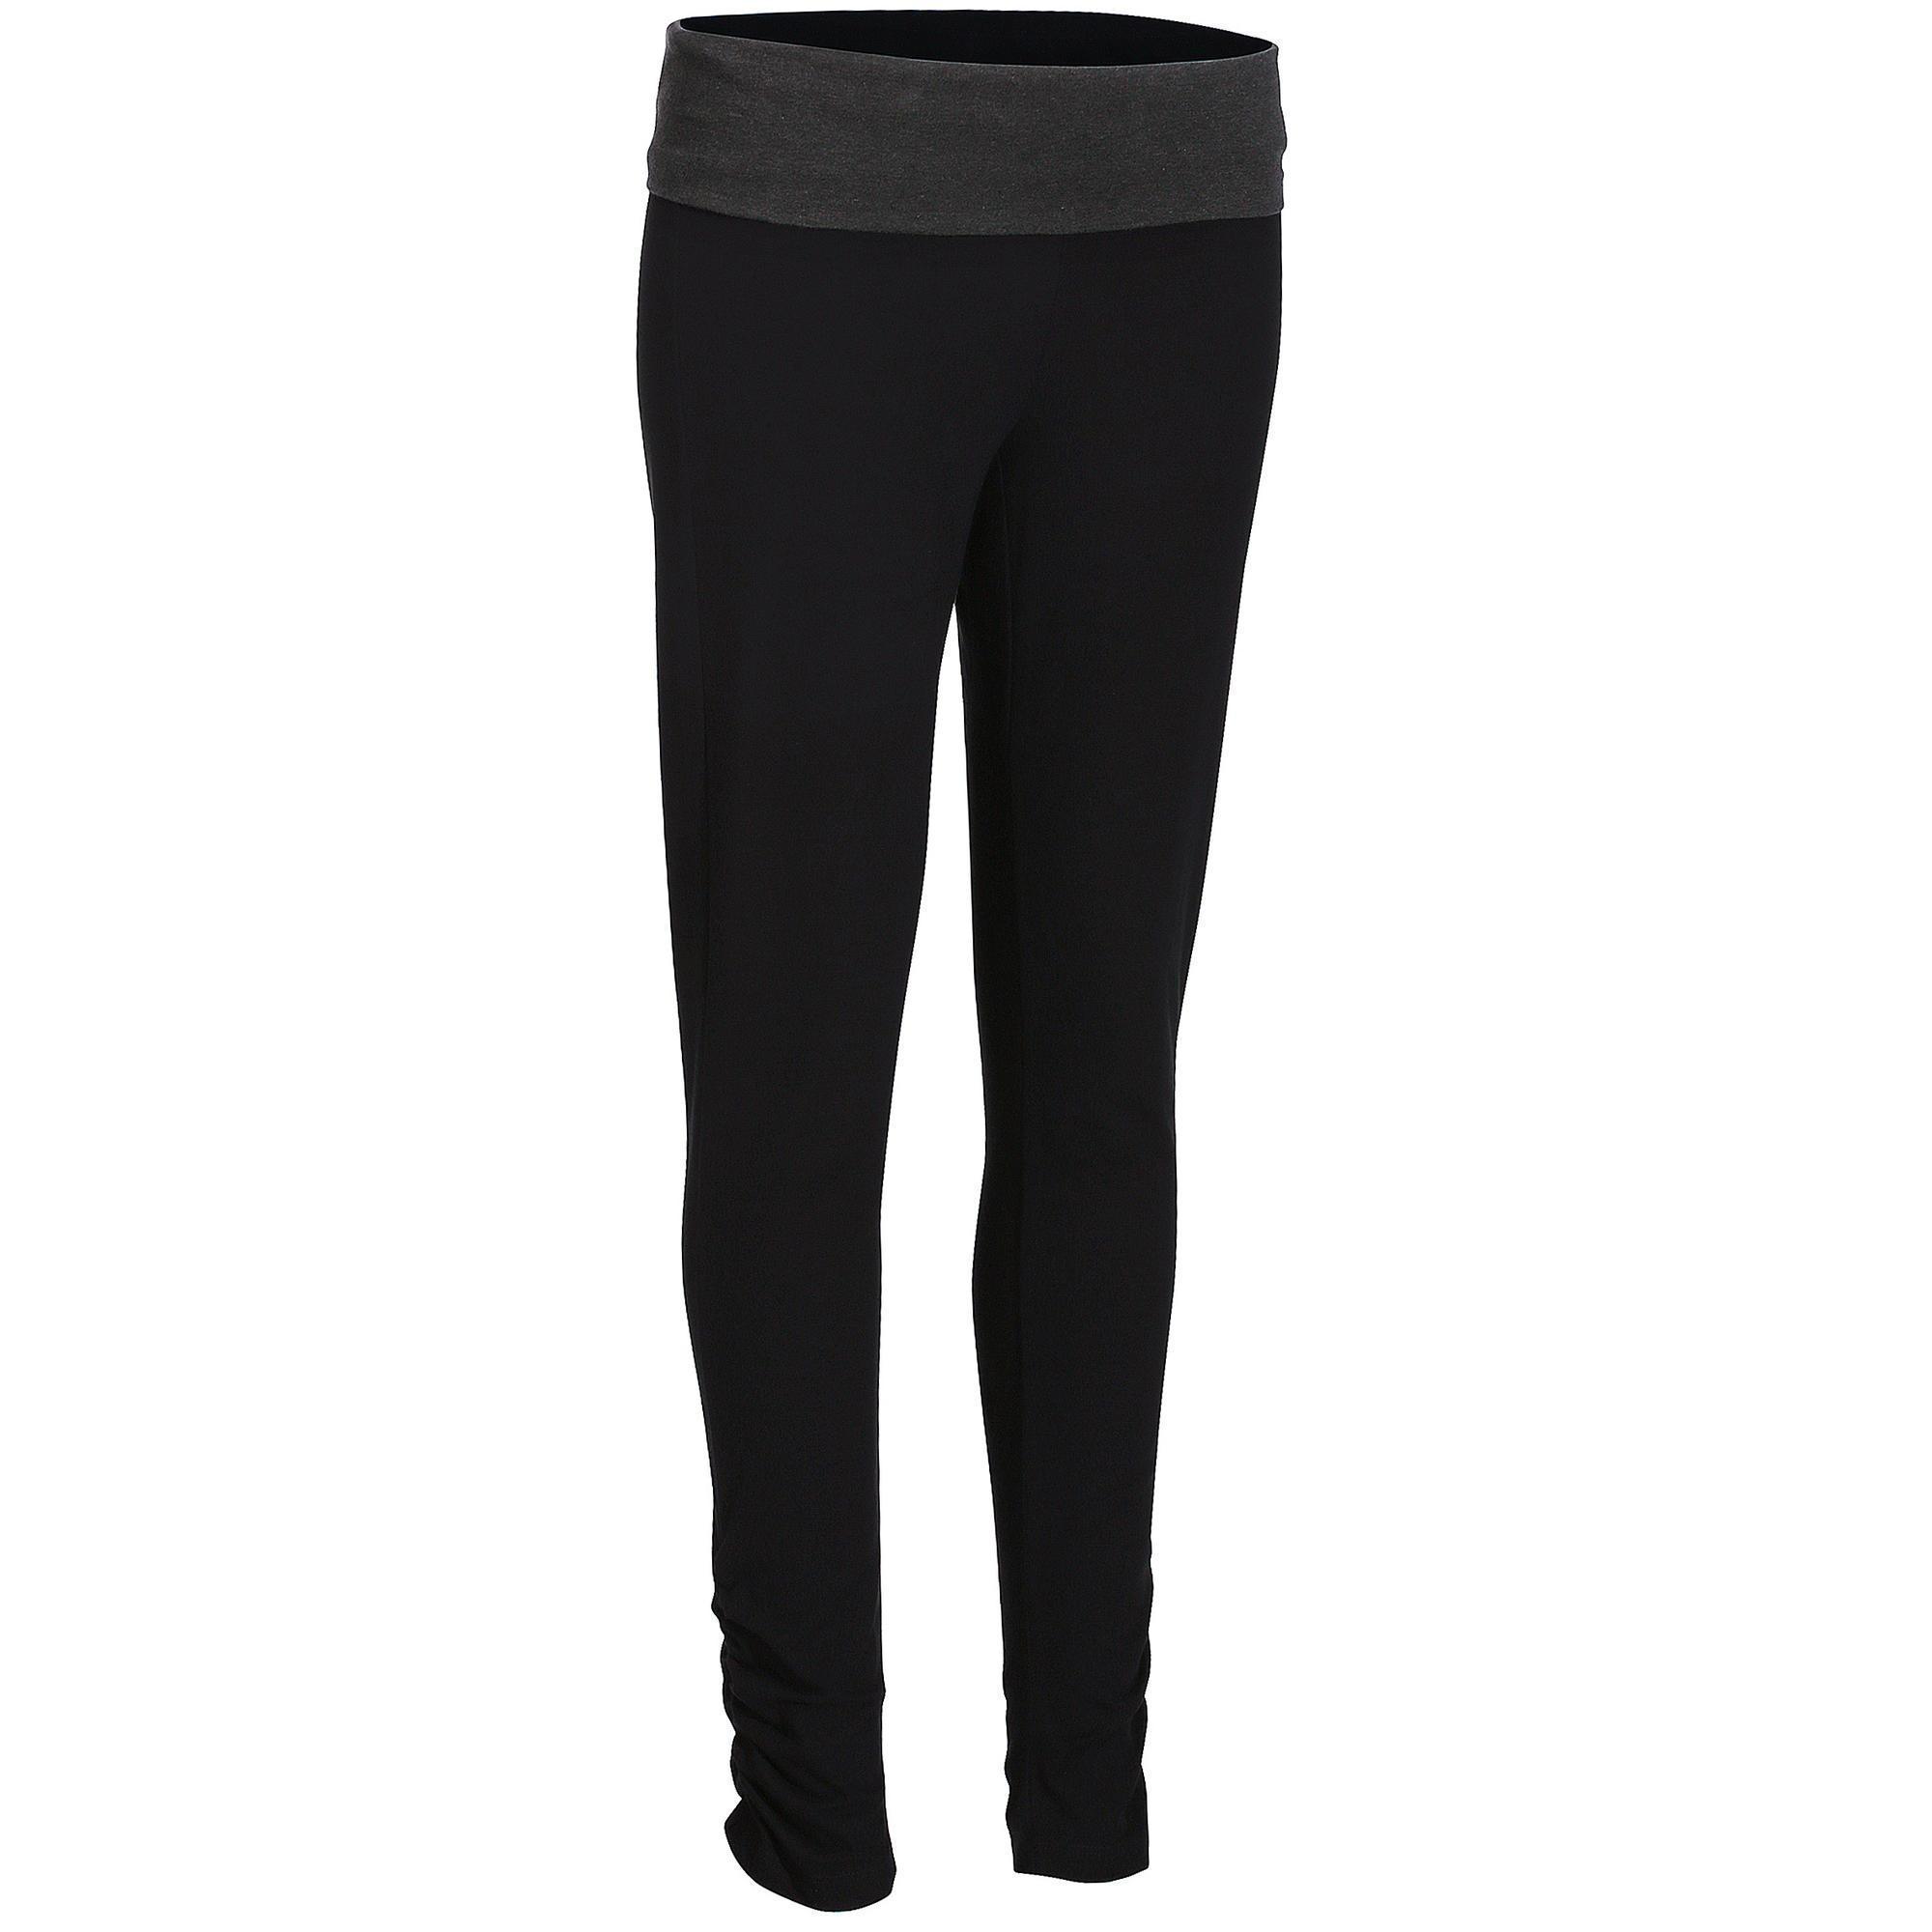 ToBeInStyle Women/'s Seamless Cotton Stretchy Band Yoga Activewear Capri Leggings